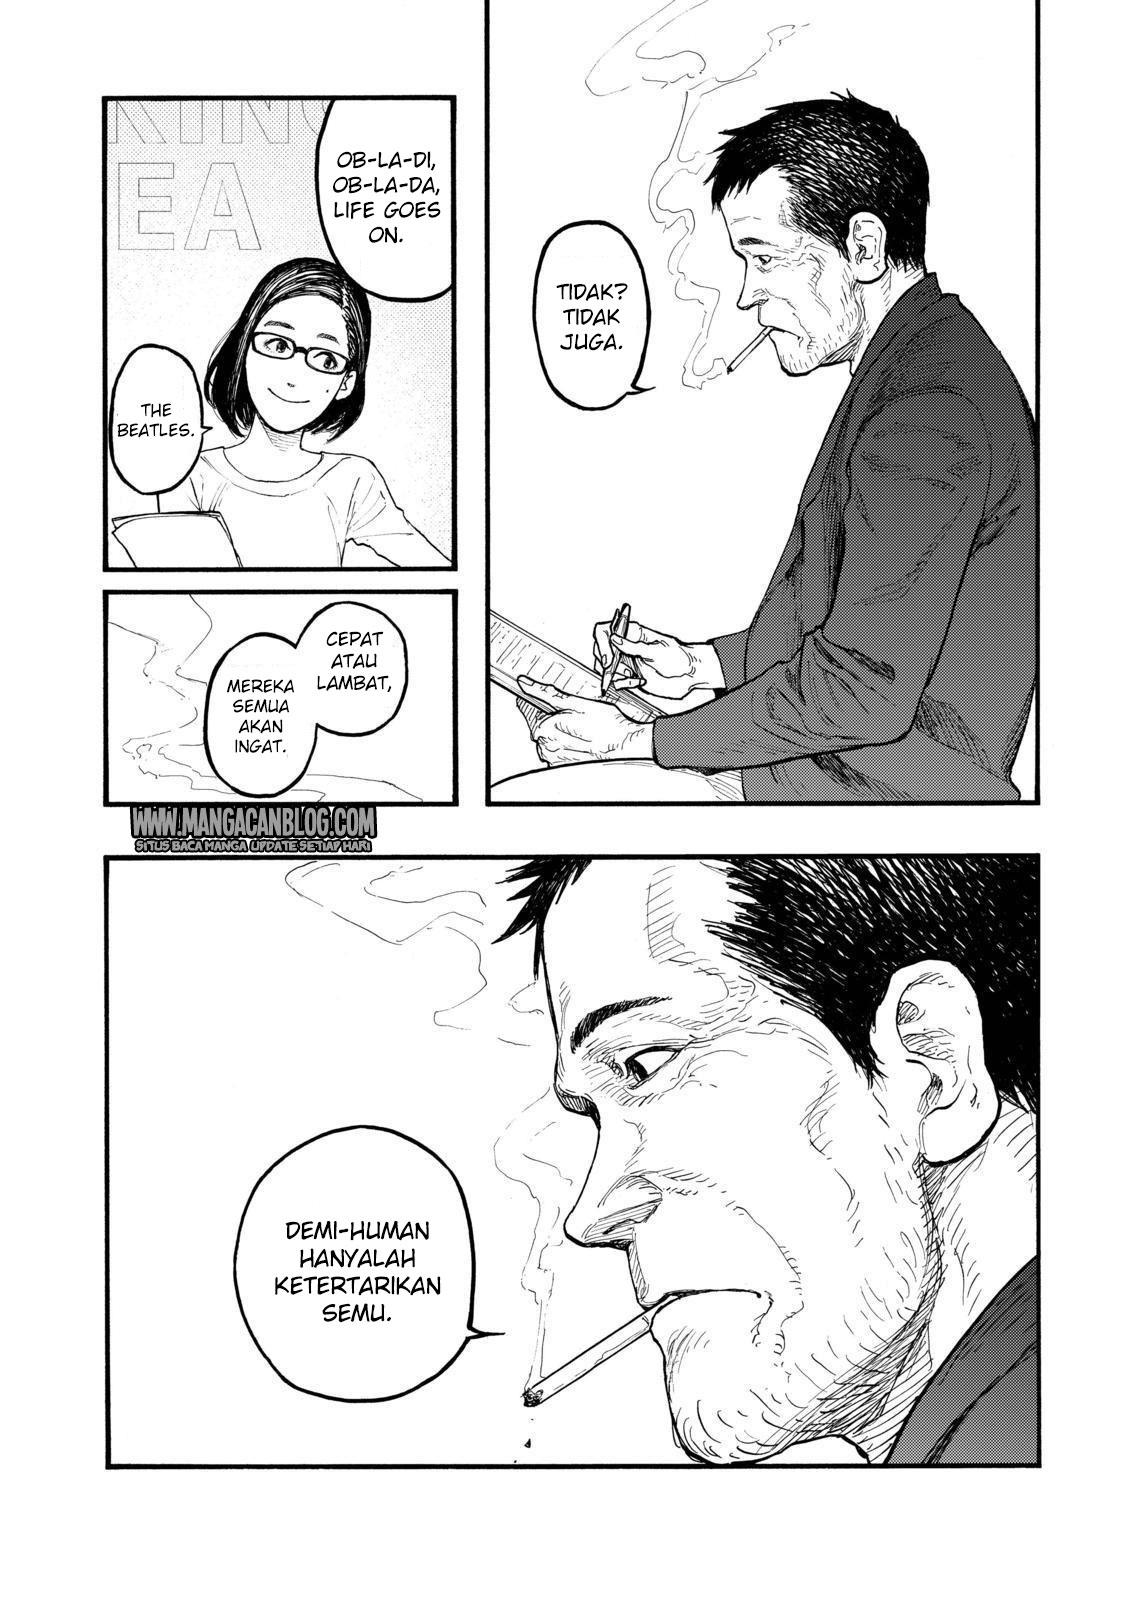 Dilarang COPAS - situs resmi www.mangacanblog.com - Komik ajin 046 - selamat pagi, sampai jumpa besok 47 Indonesia ajin 046 - selamat pagi, sampai jumpa besok Terbaru |Baca Manga Komik Indonesia|Mangacan